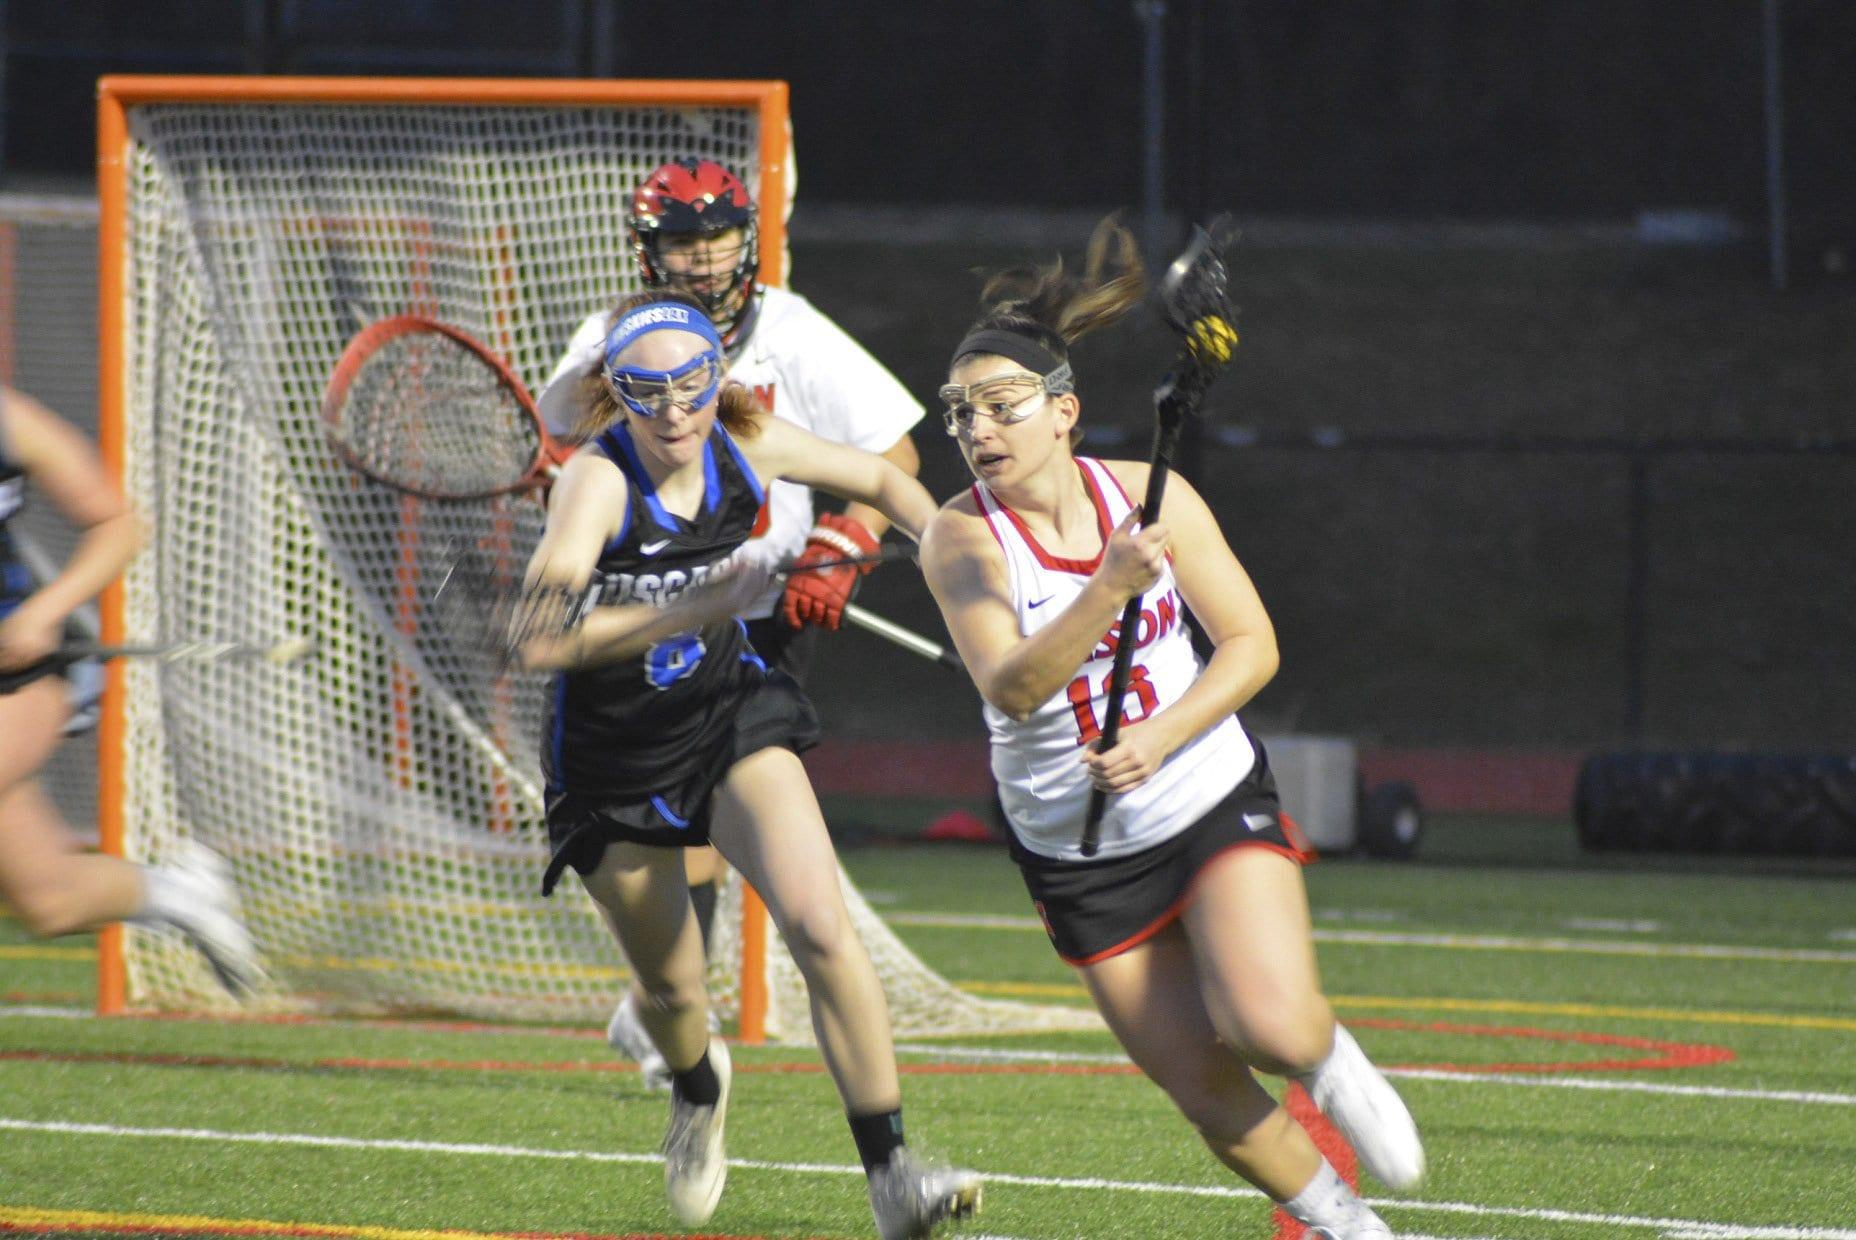 Mason senior Sarah Lubnow drives to the goal against Loudoun County High School on Tuesday. (Photo: Carol Sly)